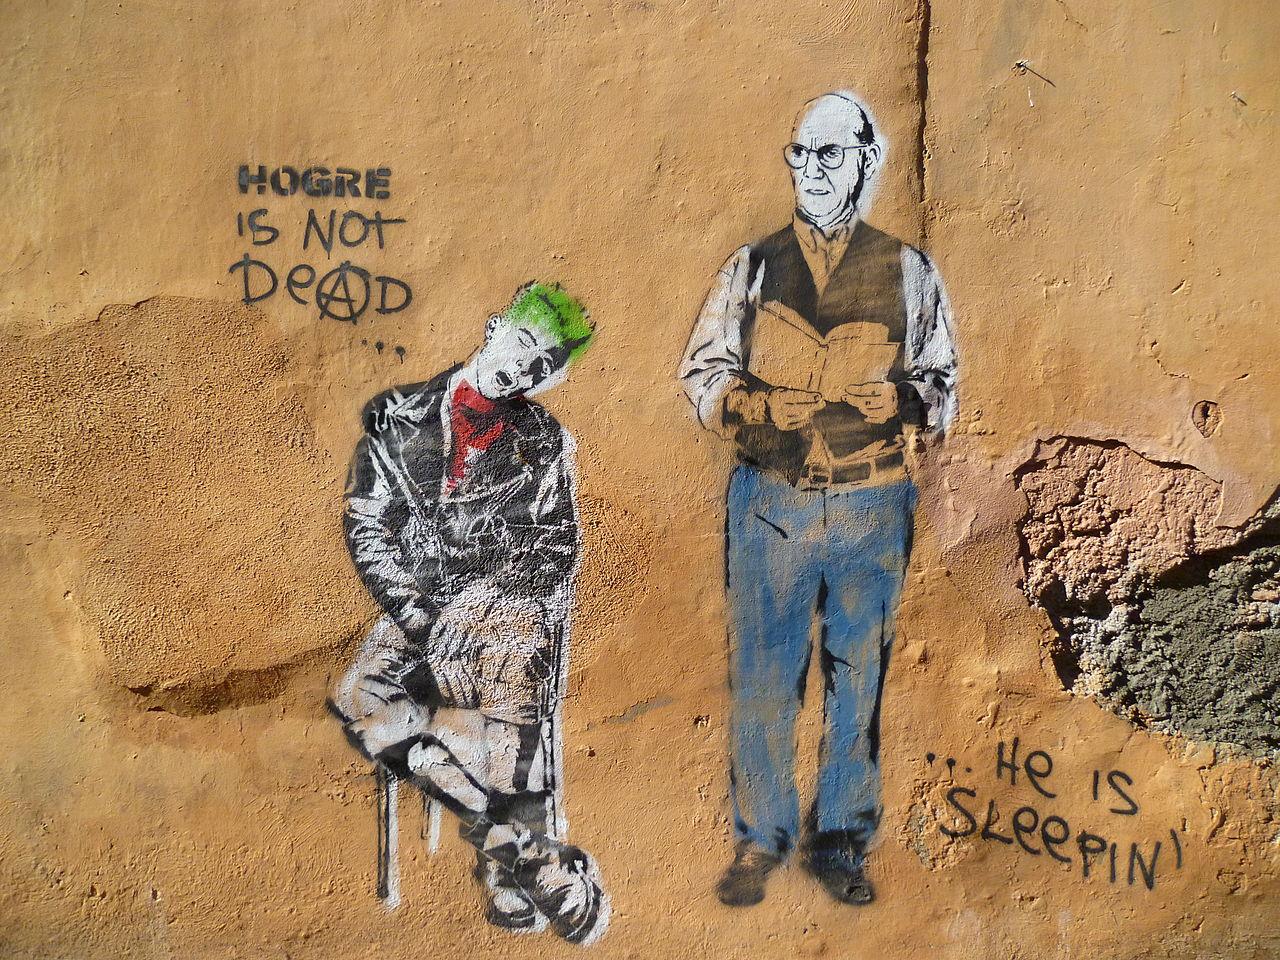 Hogre is not dead ... Street art Rome.jpg